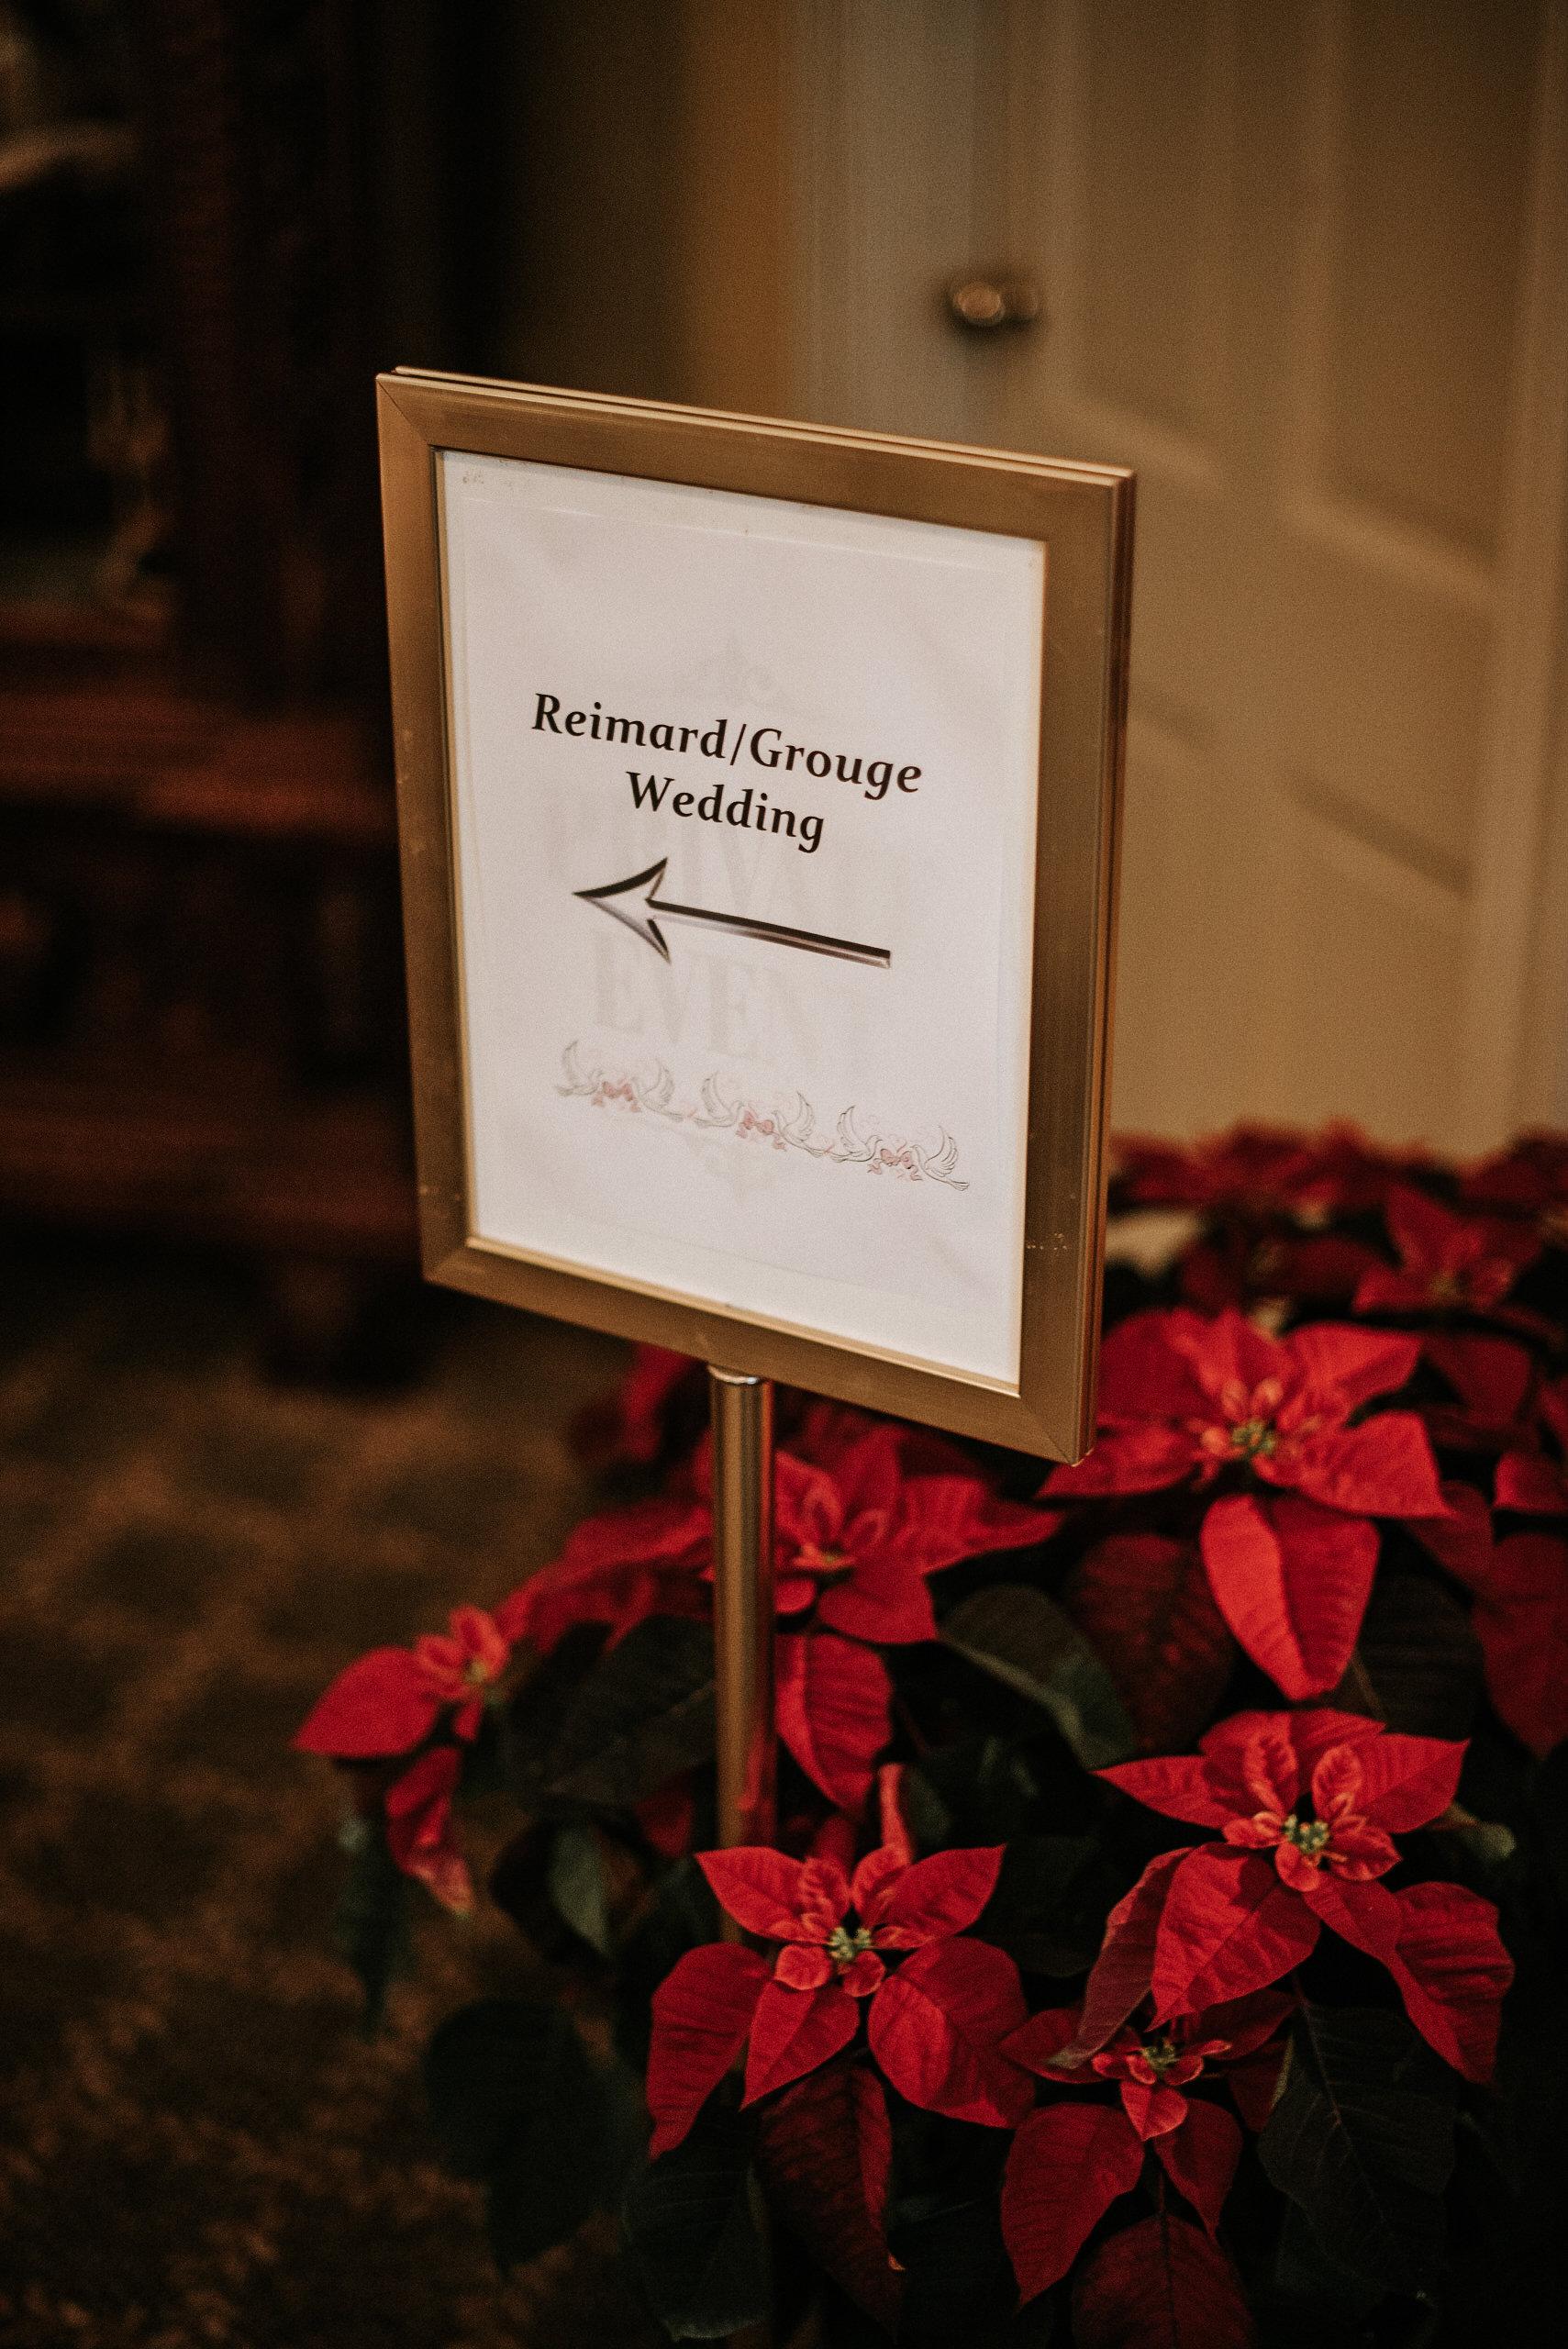 Signage in wedding venue